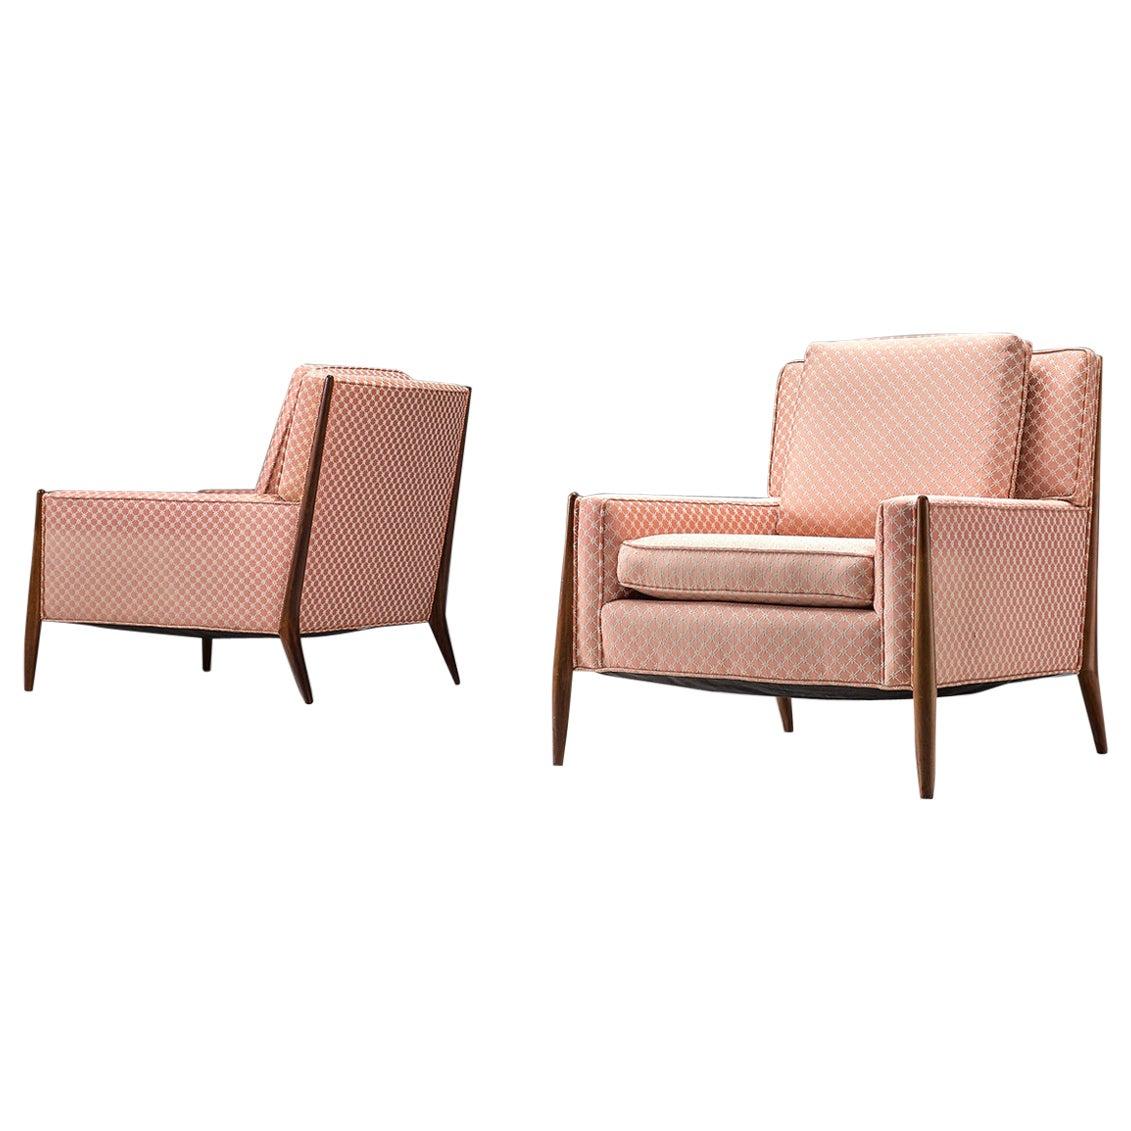 Jules Heumann Pair of Pink Lounge Chairs